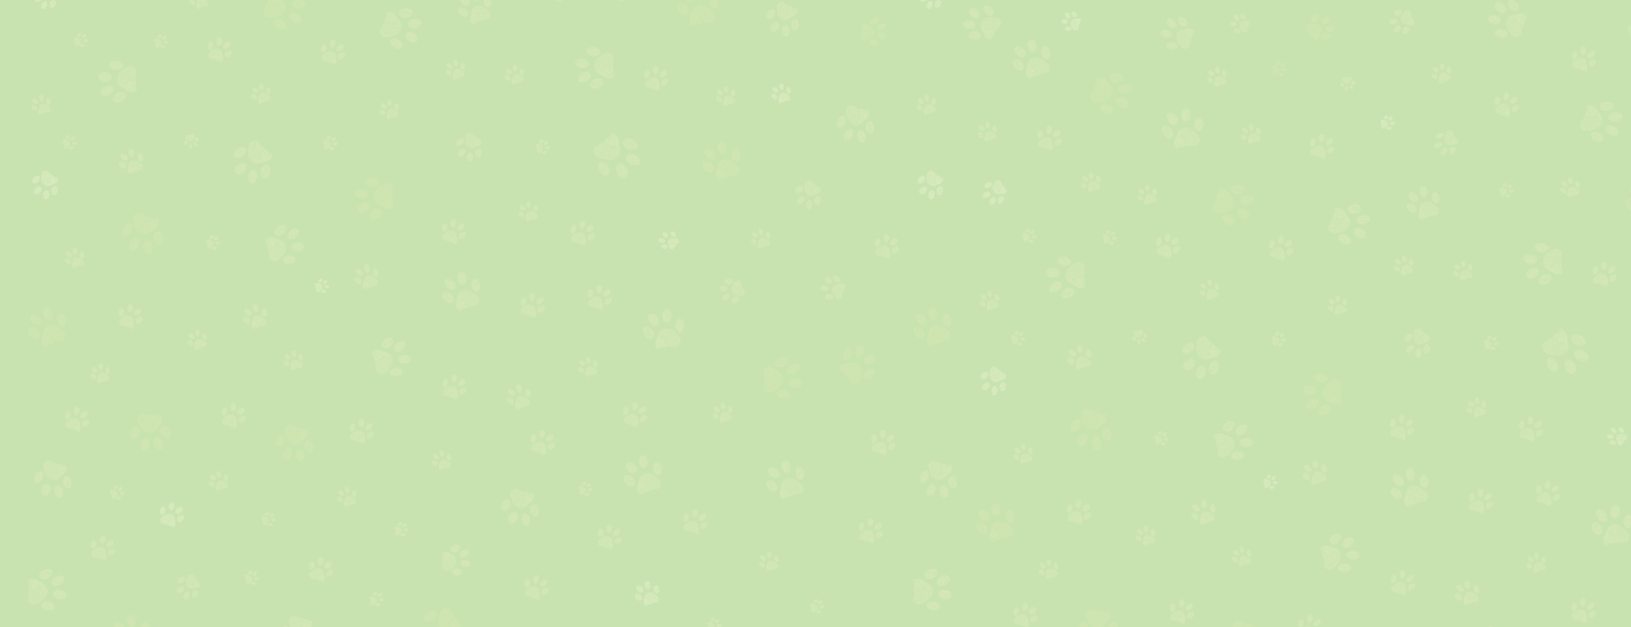 Green BG_paws.png